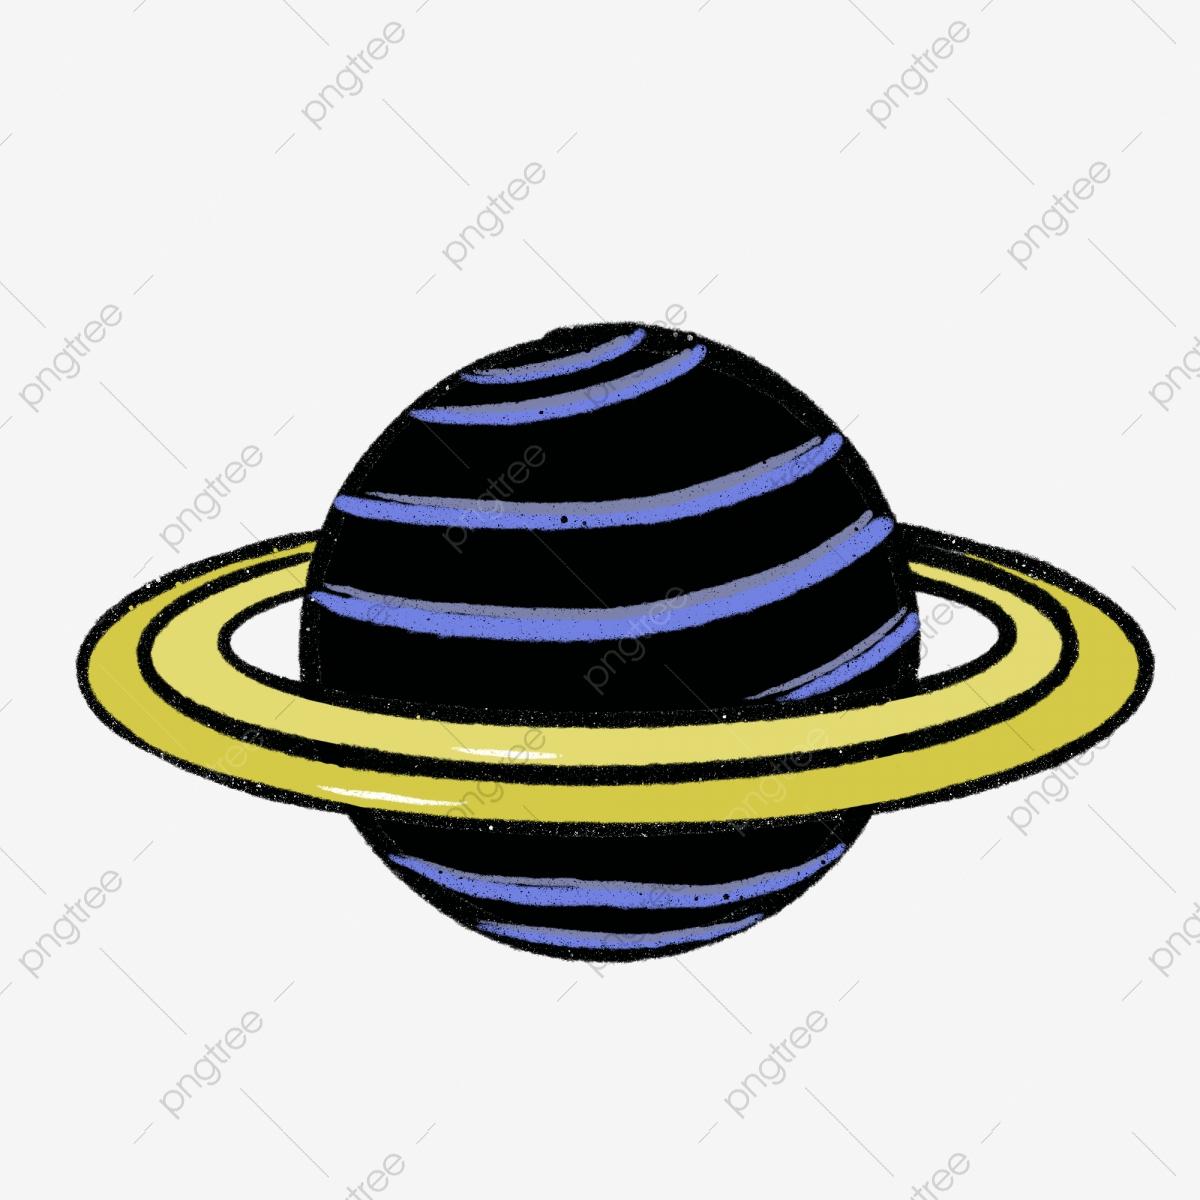 Saturn Aura Aura Saturne Illustration Gratuite Illustration serapportantà Saturne Dessin